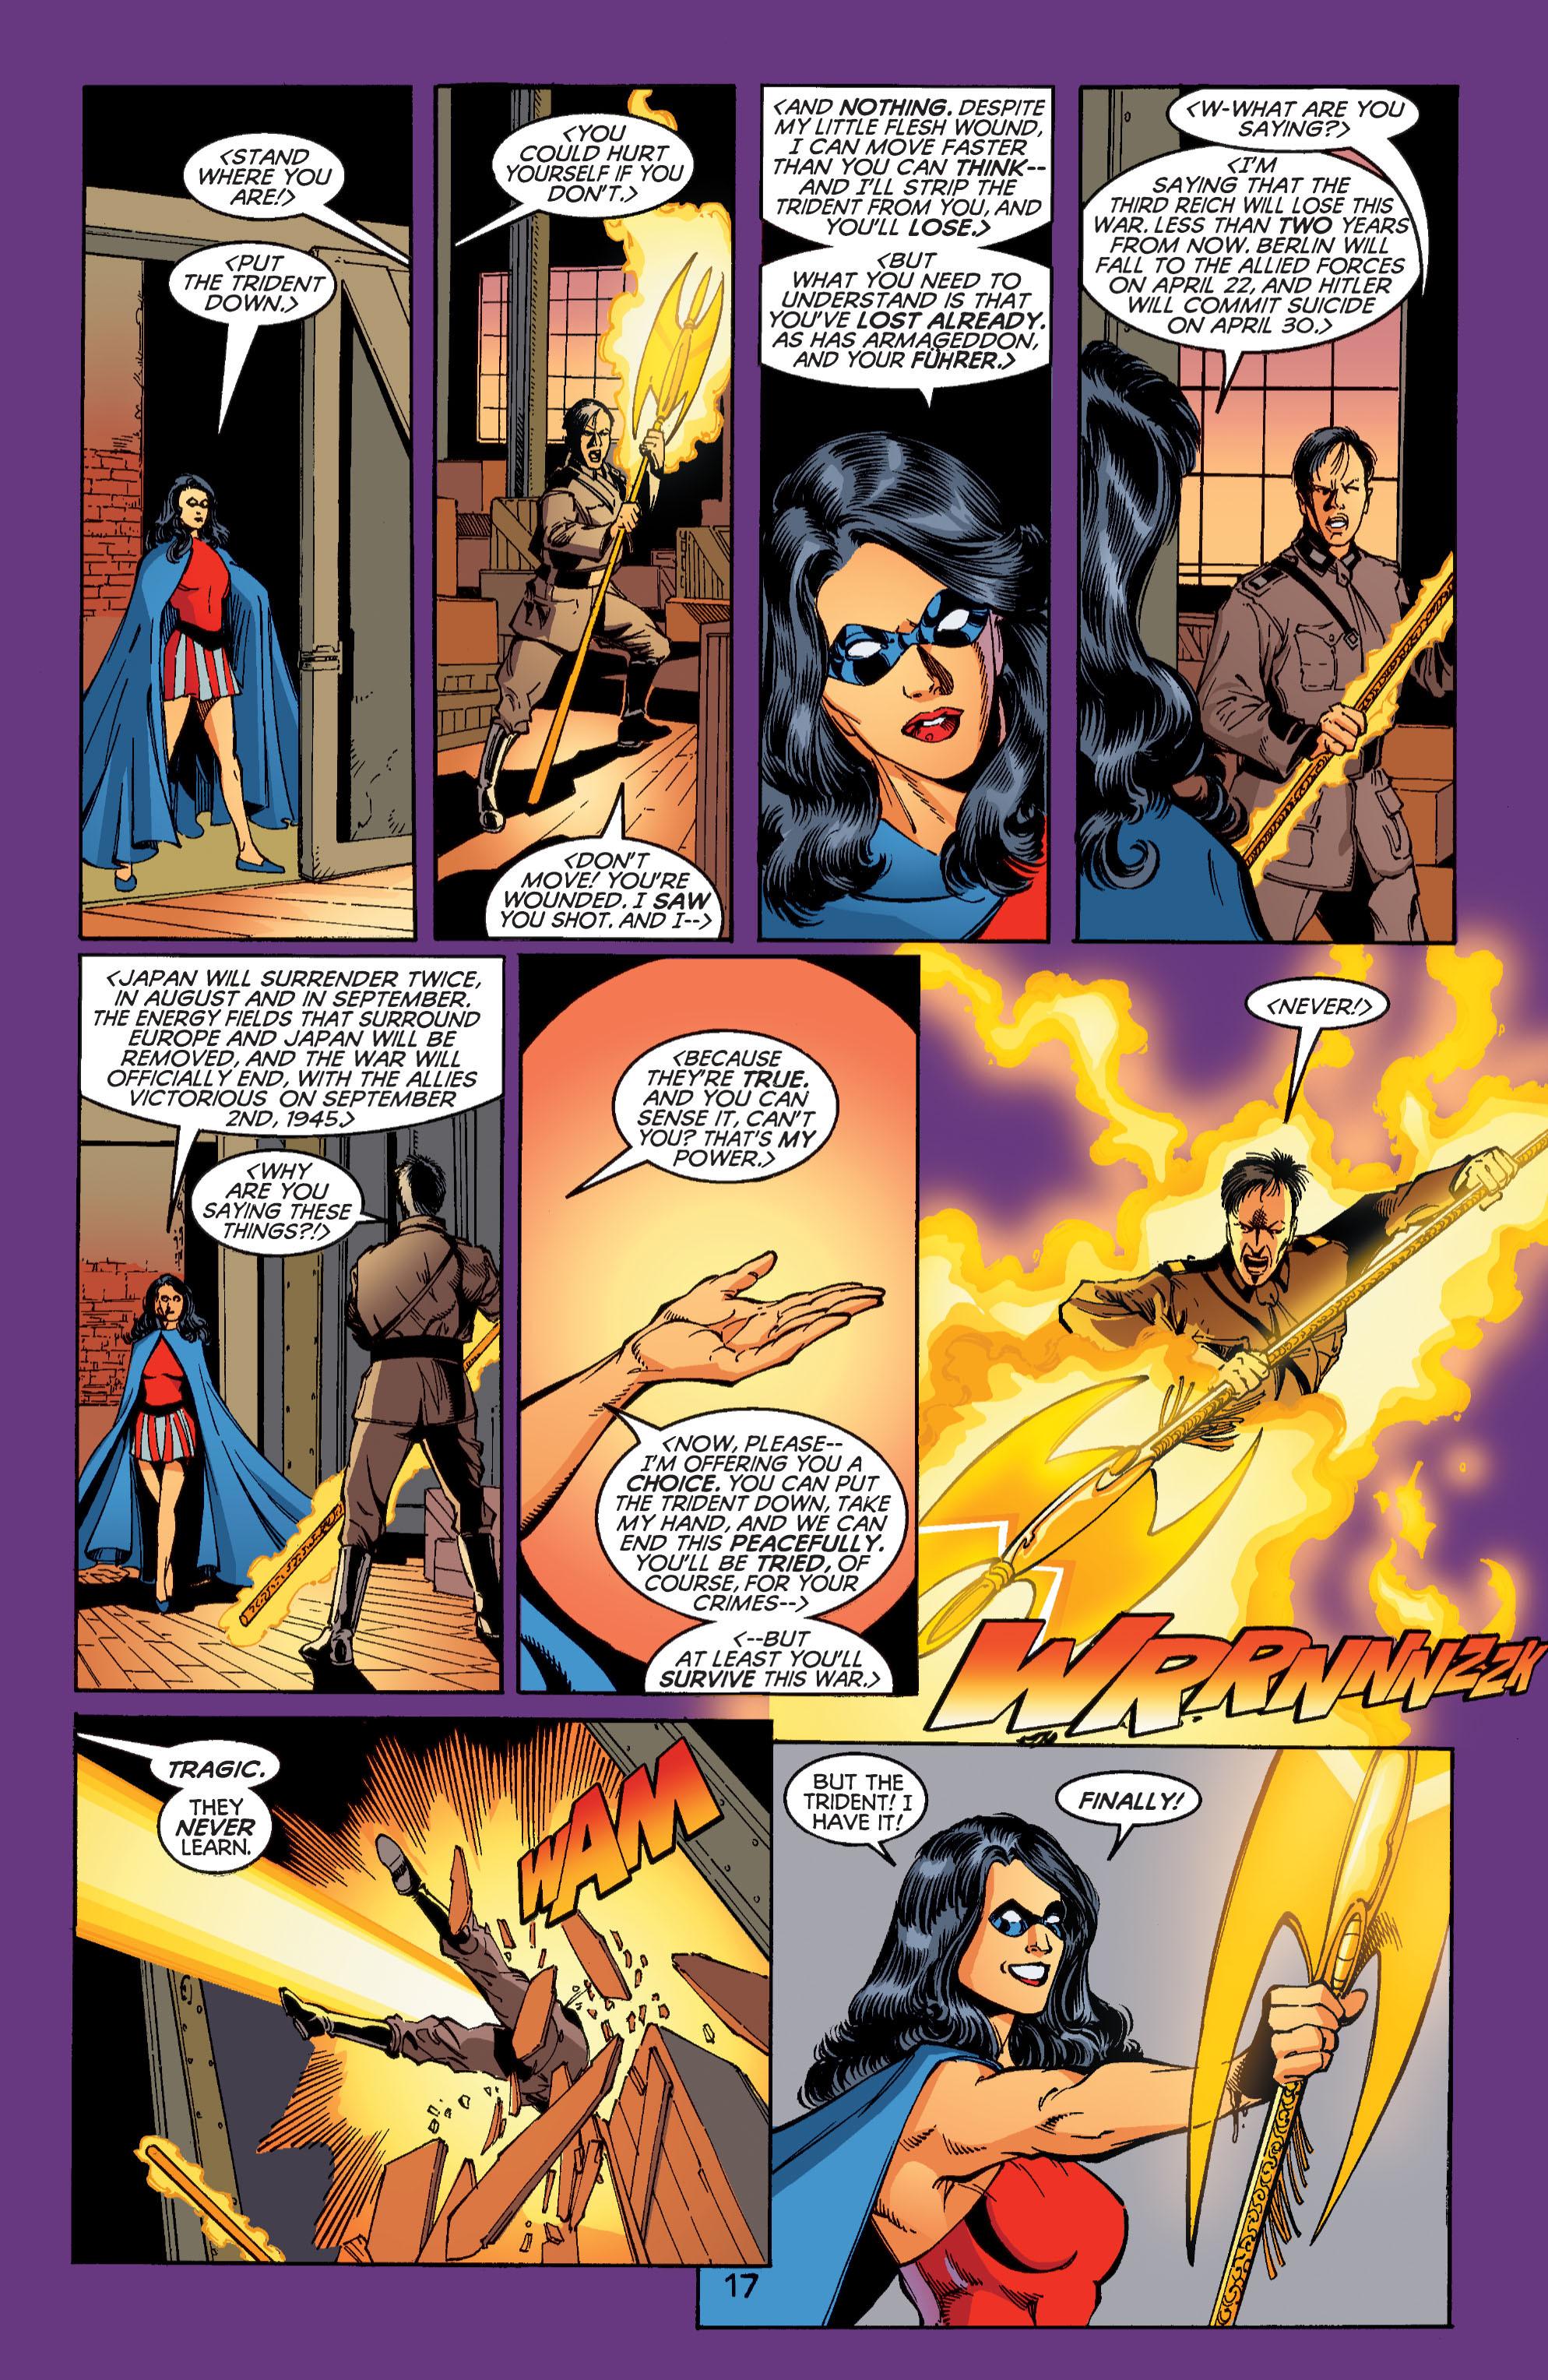 Read online Wonder Woman (1987) comic -  Issue #185 - 18